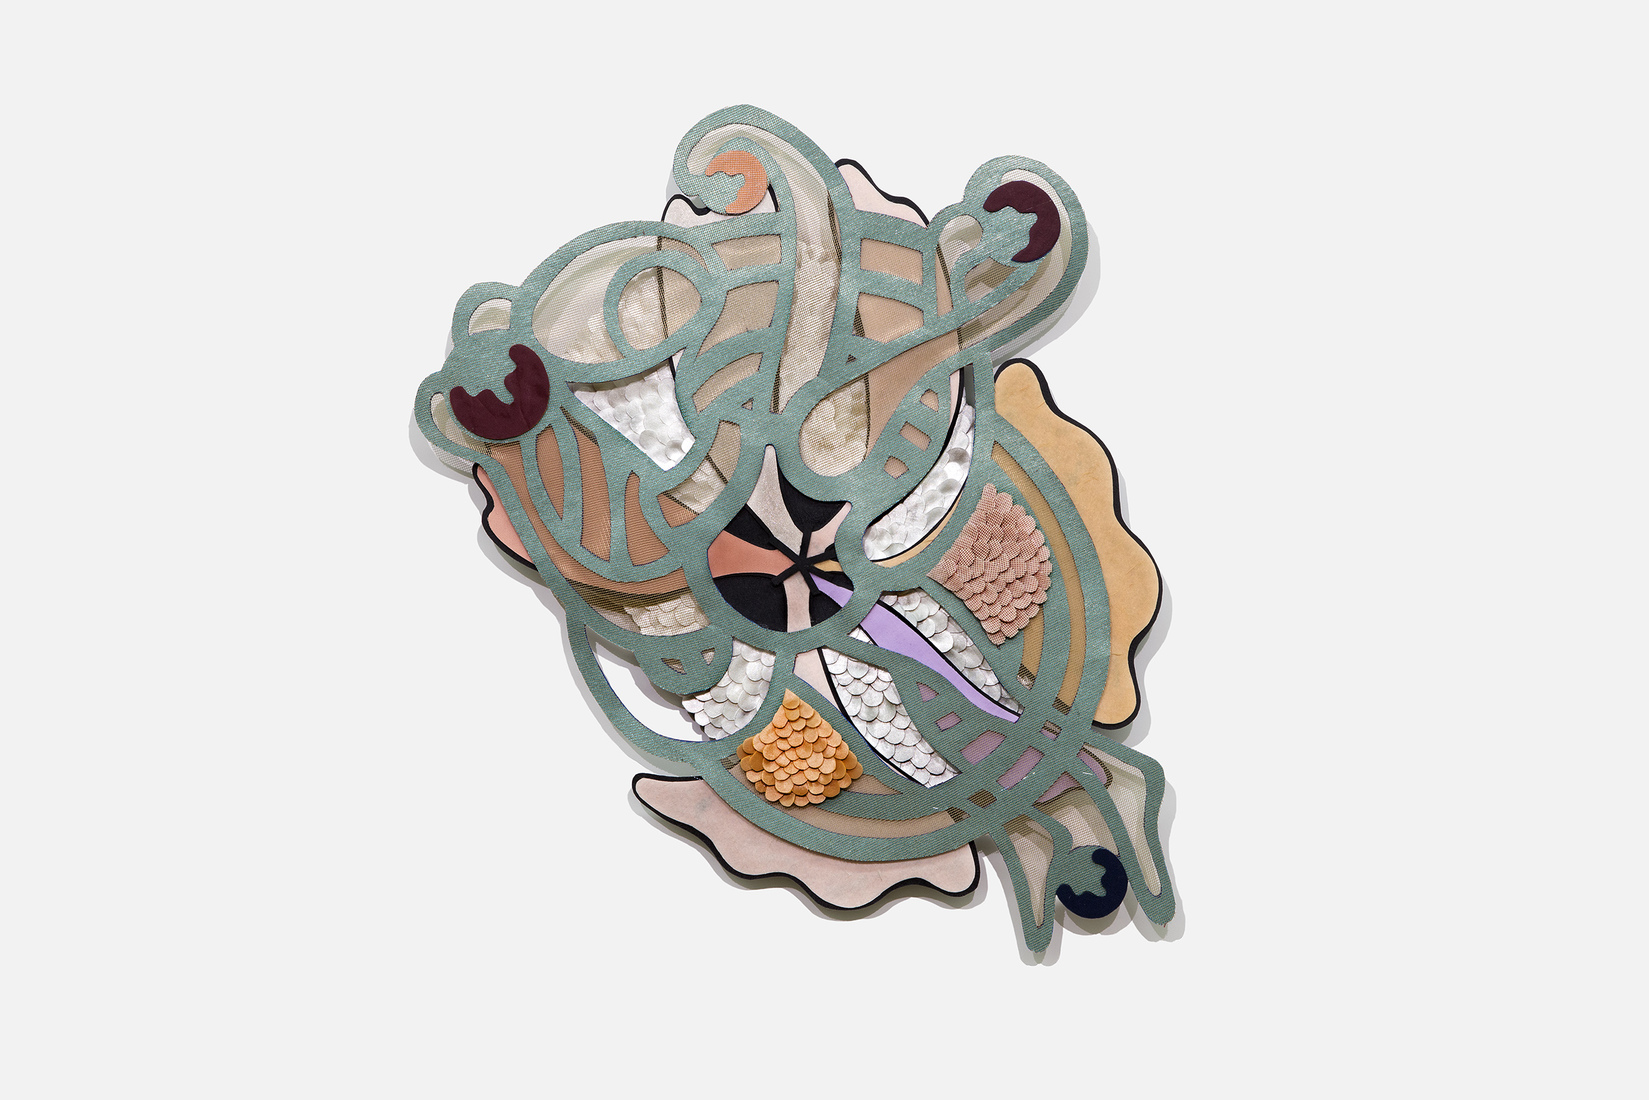 GERHARDT KNODEL Minglings: A Journey Across Time: 2015-2017 # 19. Ai